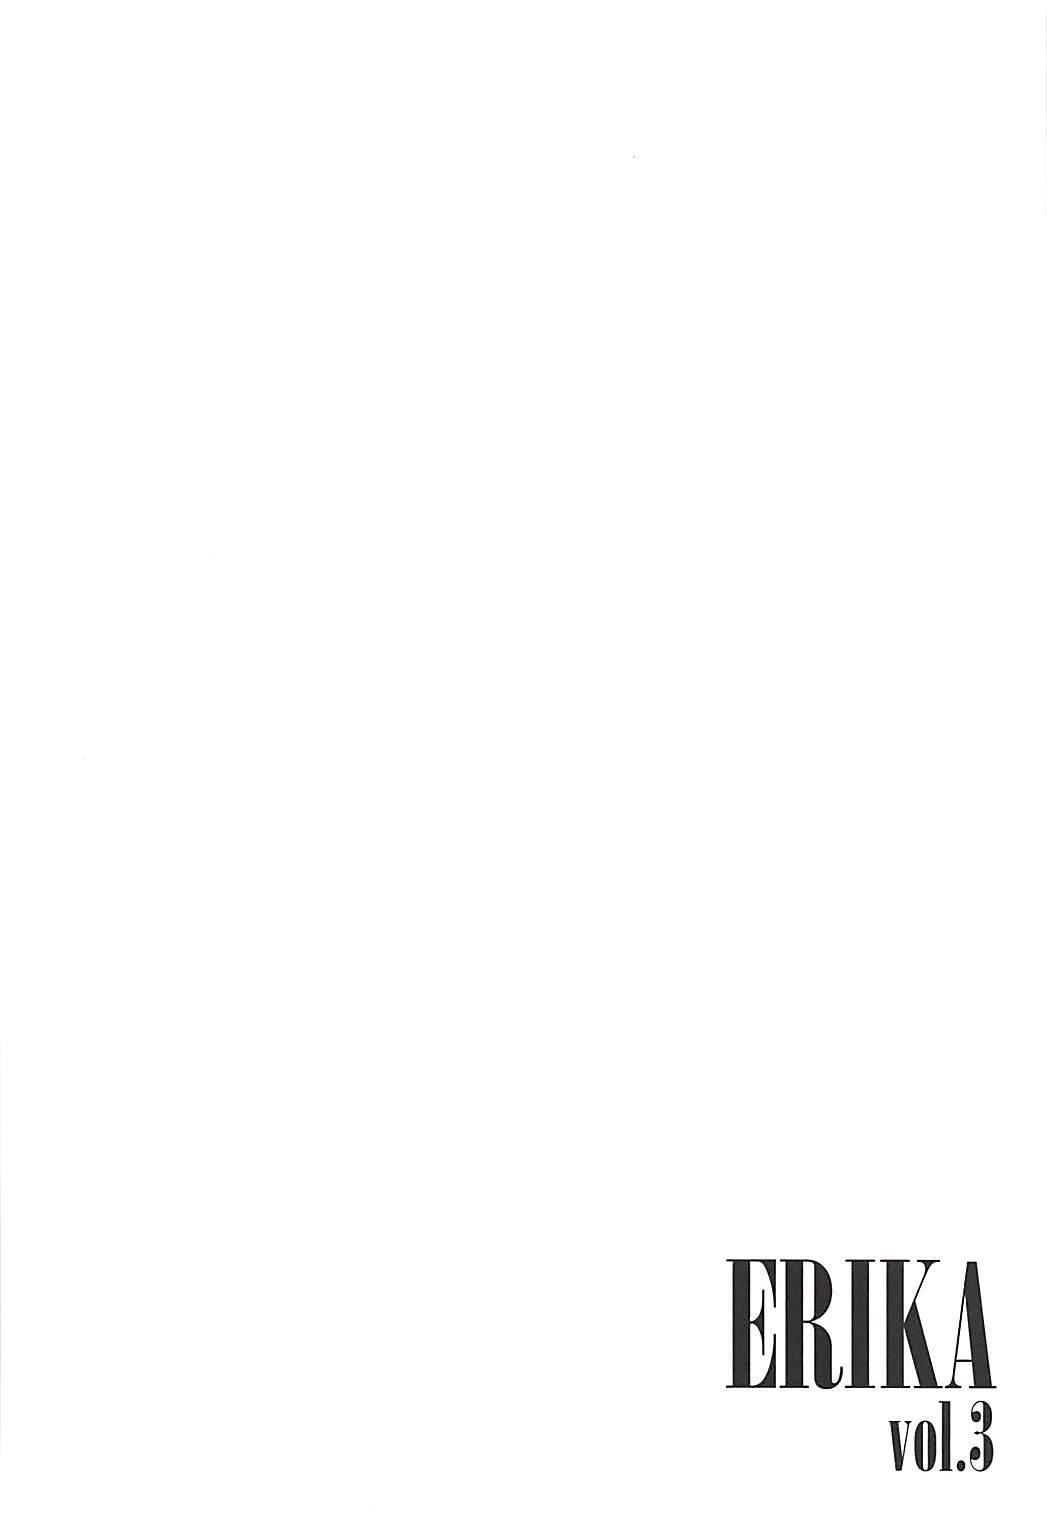 ERIKA Vol. 3 8